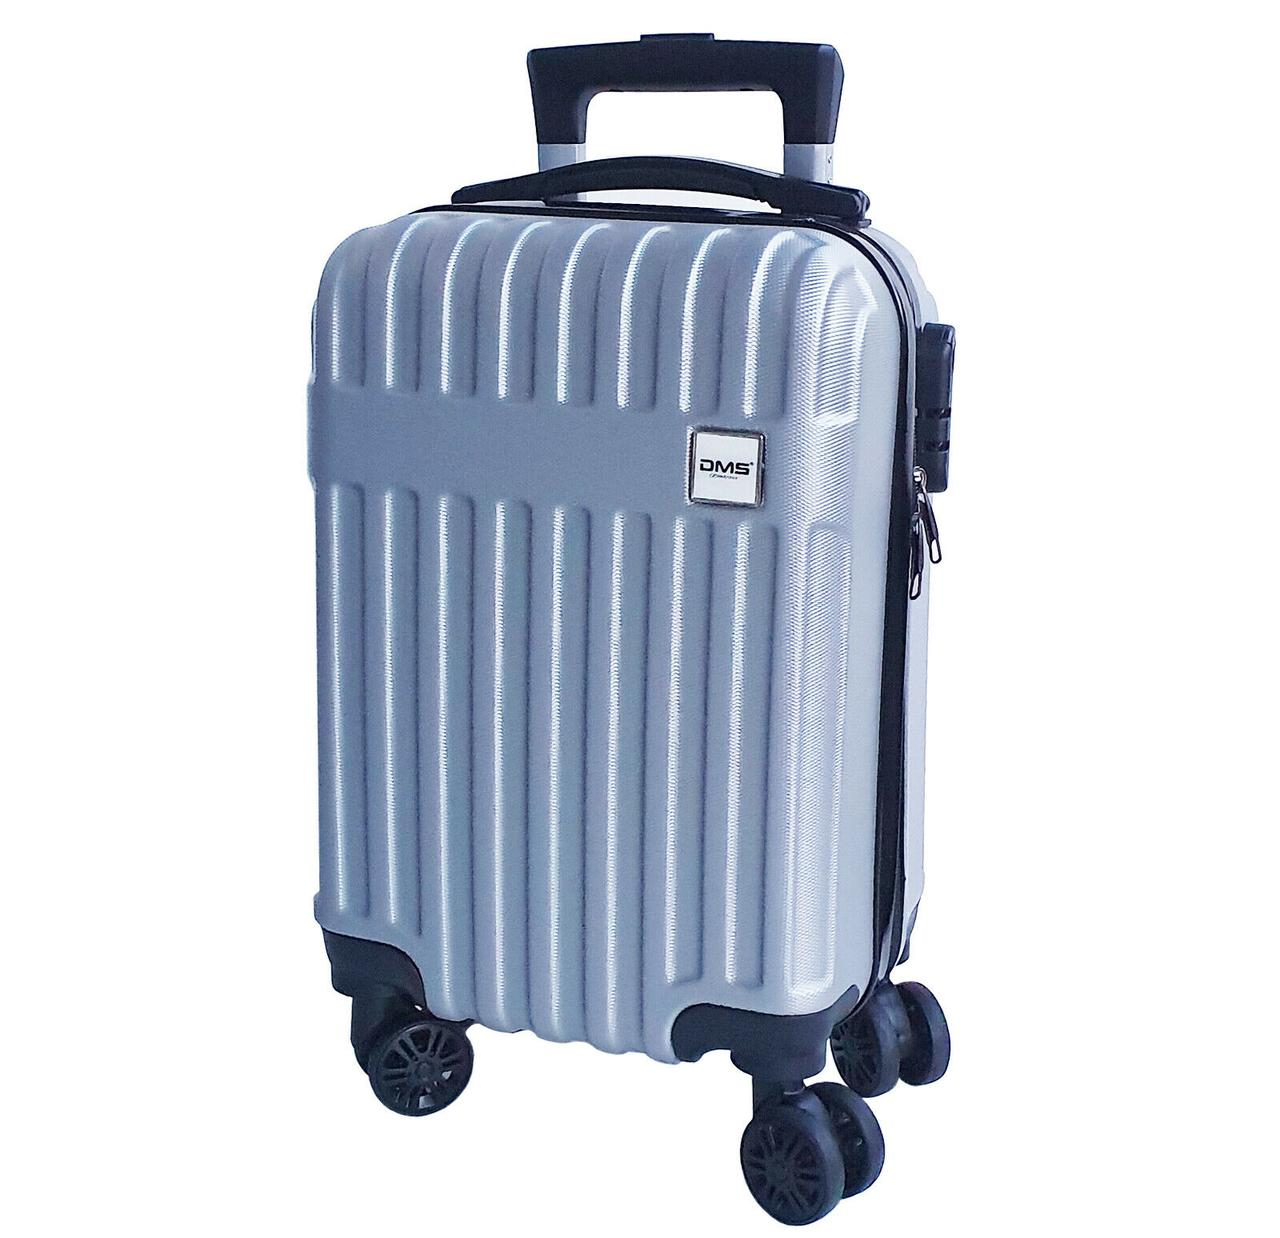 Чемоданы дорожные DMS с тележкой, размер M: 45L, 57 x 37 x 24 см серый Silver